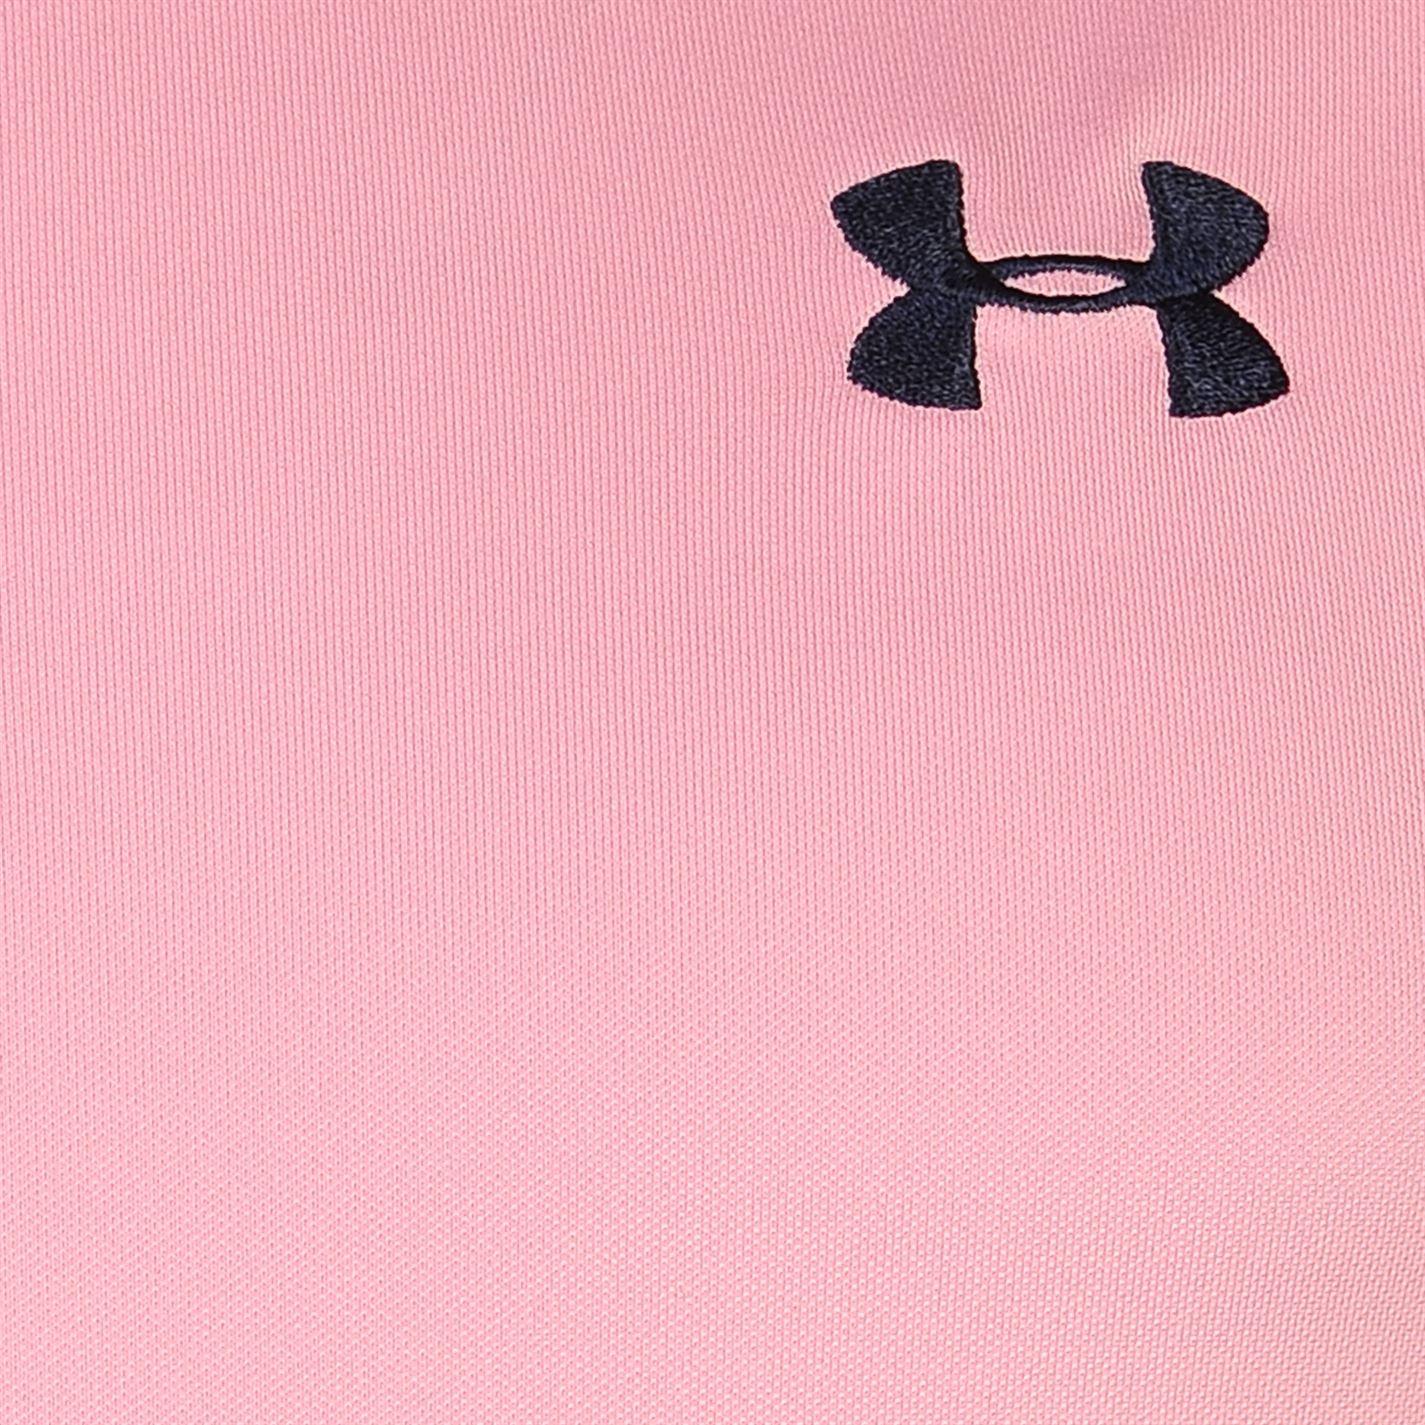 Under-Armour-Camiseta-Polo-para-hombre-realizar-Manga-Corta-Camiseta-Top-Golf-Deportes miniatura 26